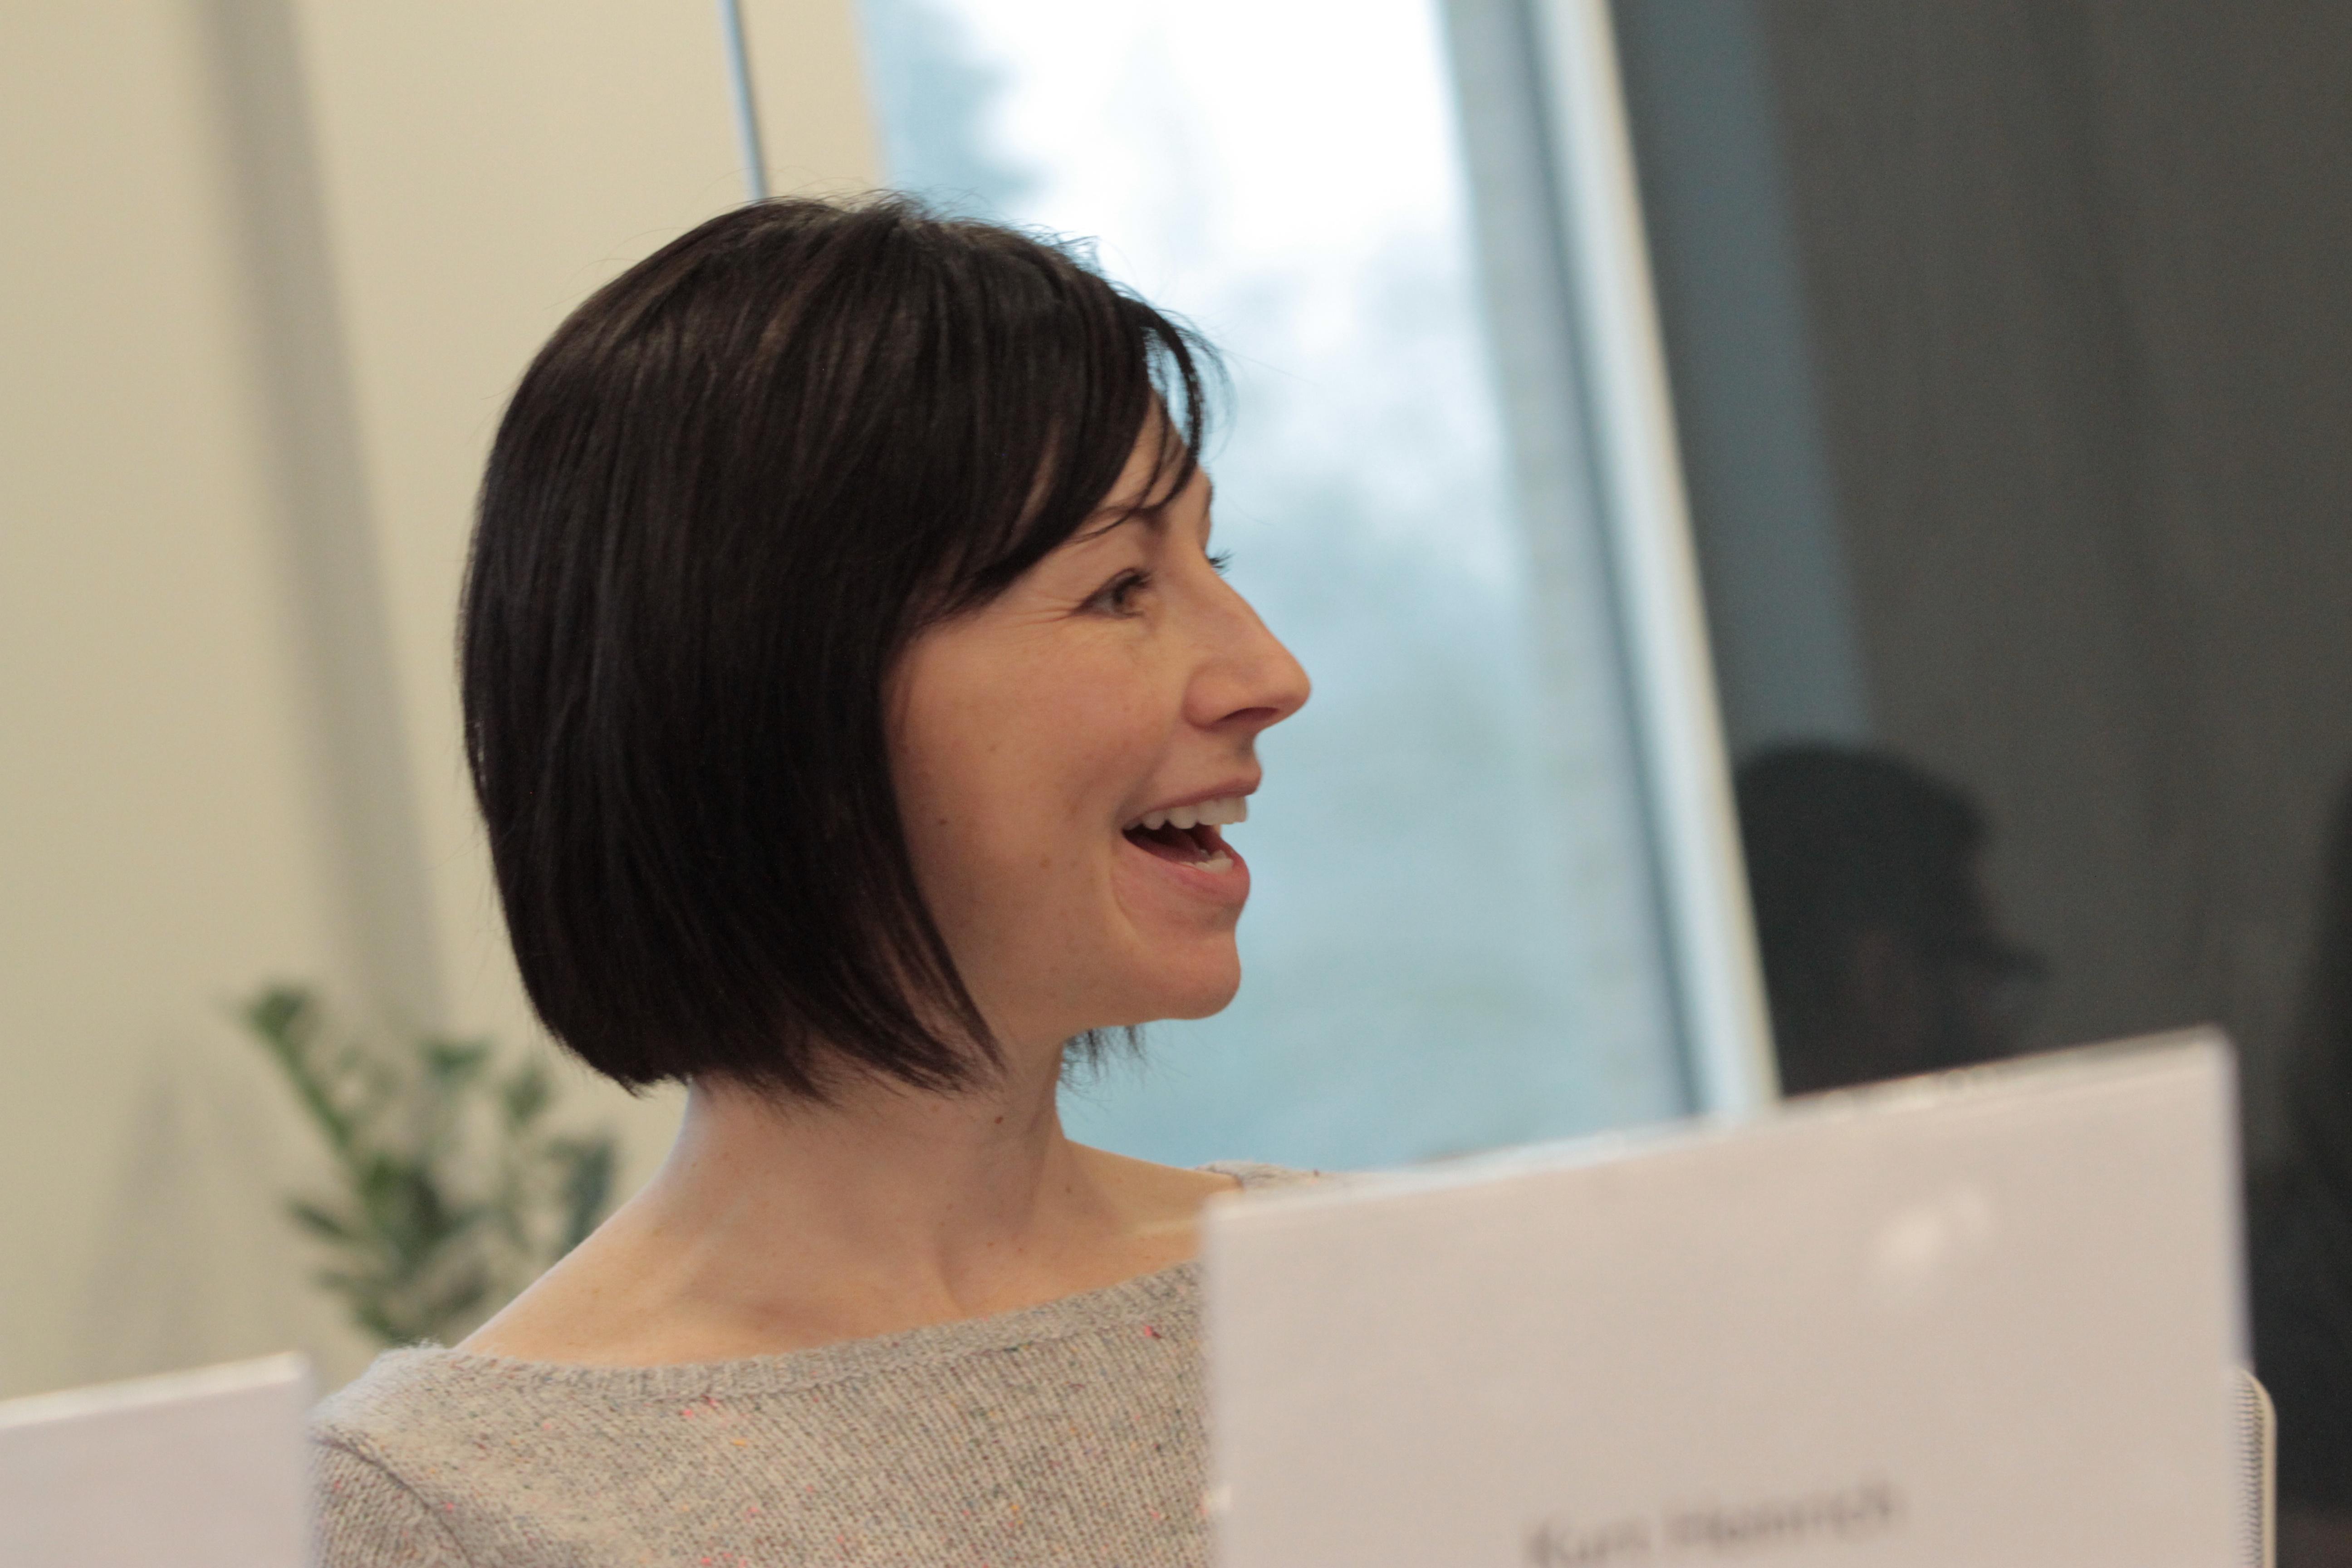 Inside Leadership: Q&A with Kristin Linklater, SFU